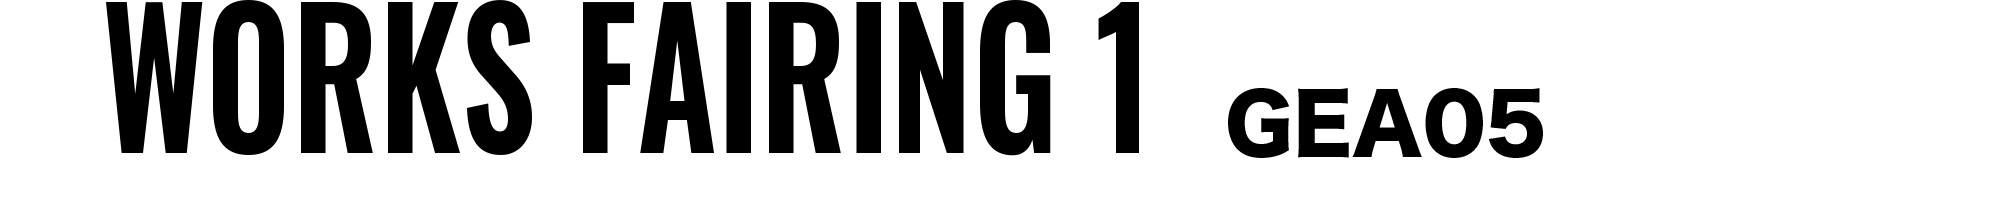 UBC ワークスフェアリング1